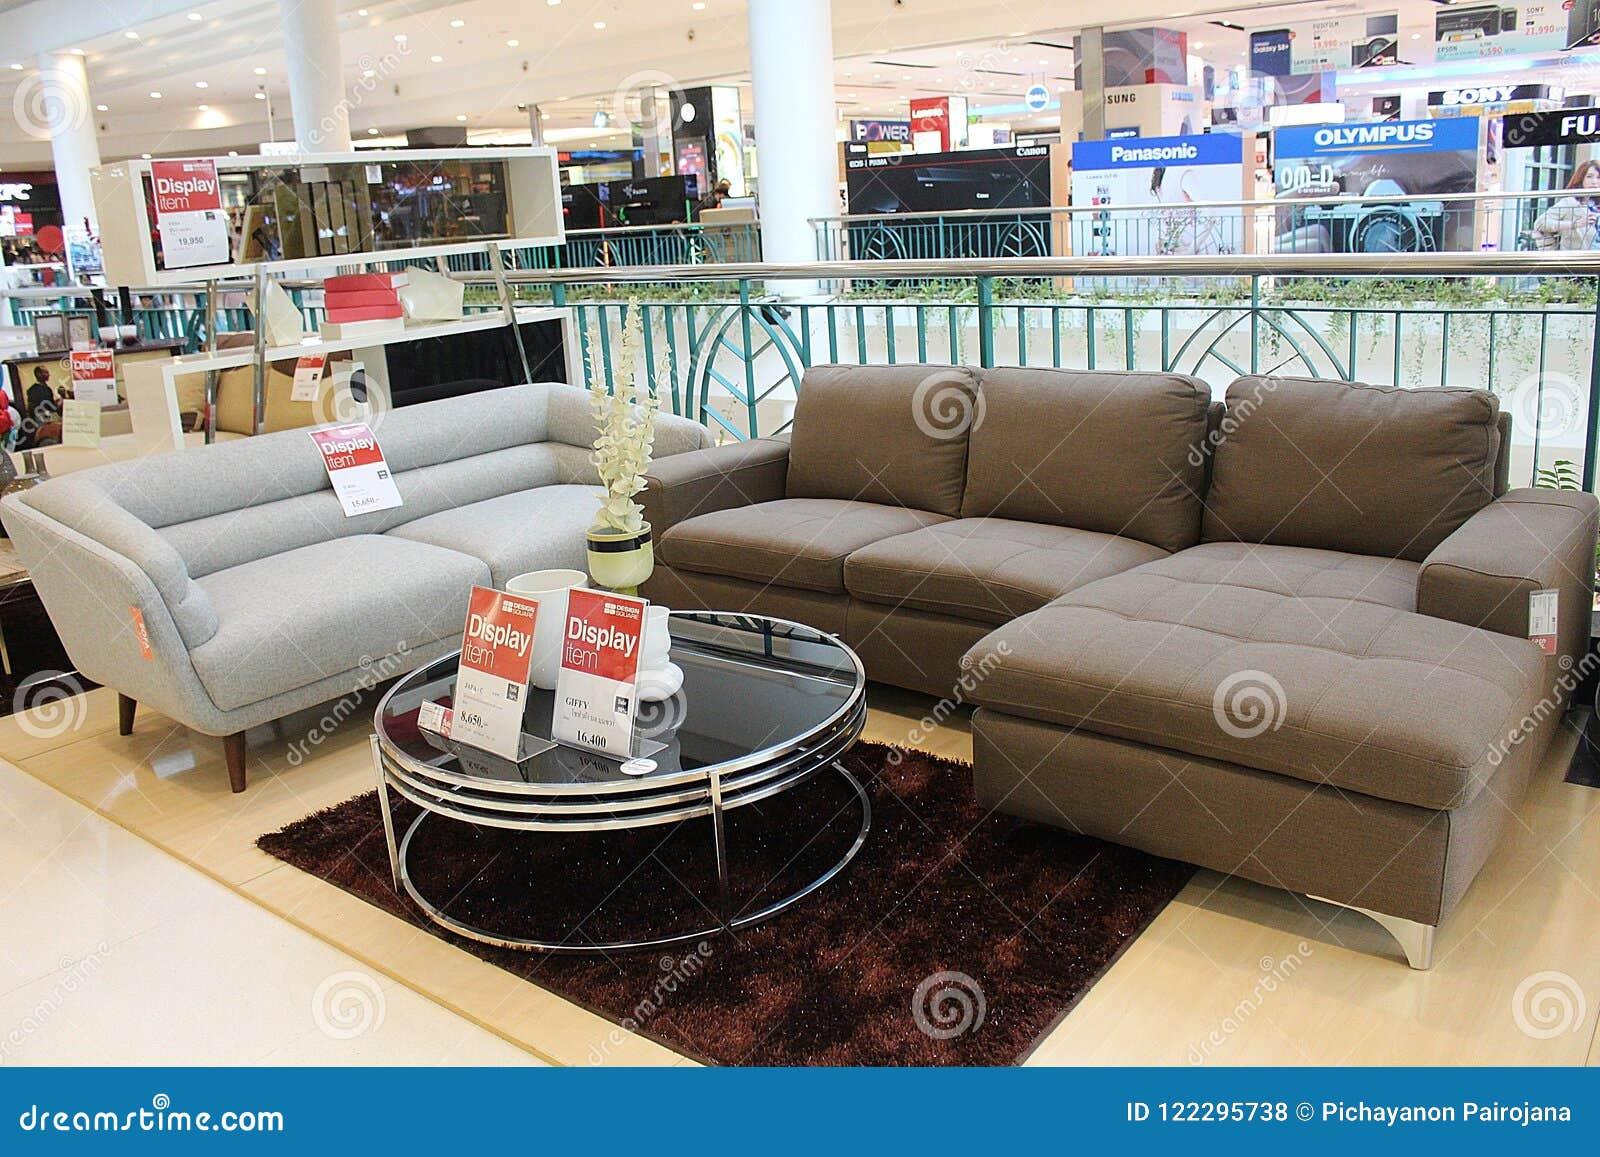 Be modern design nakhonratchasima thailand †july furniture goods show sell mall korat province 122295738 jpg